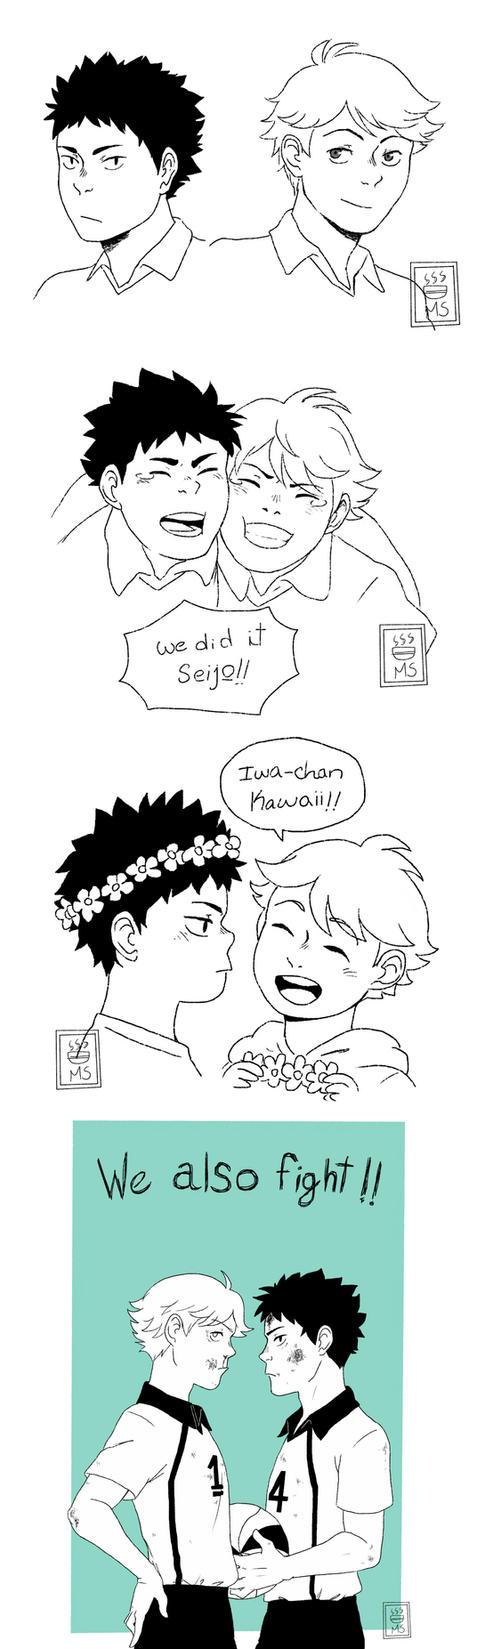 Haikyuu!! Seijou by MaggieSoup